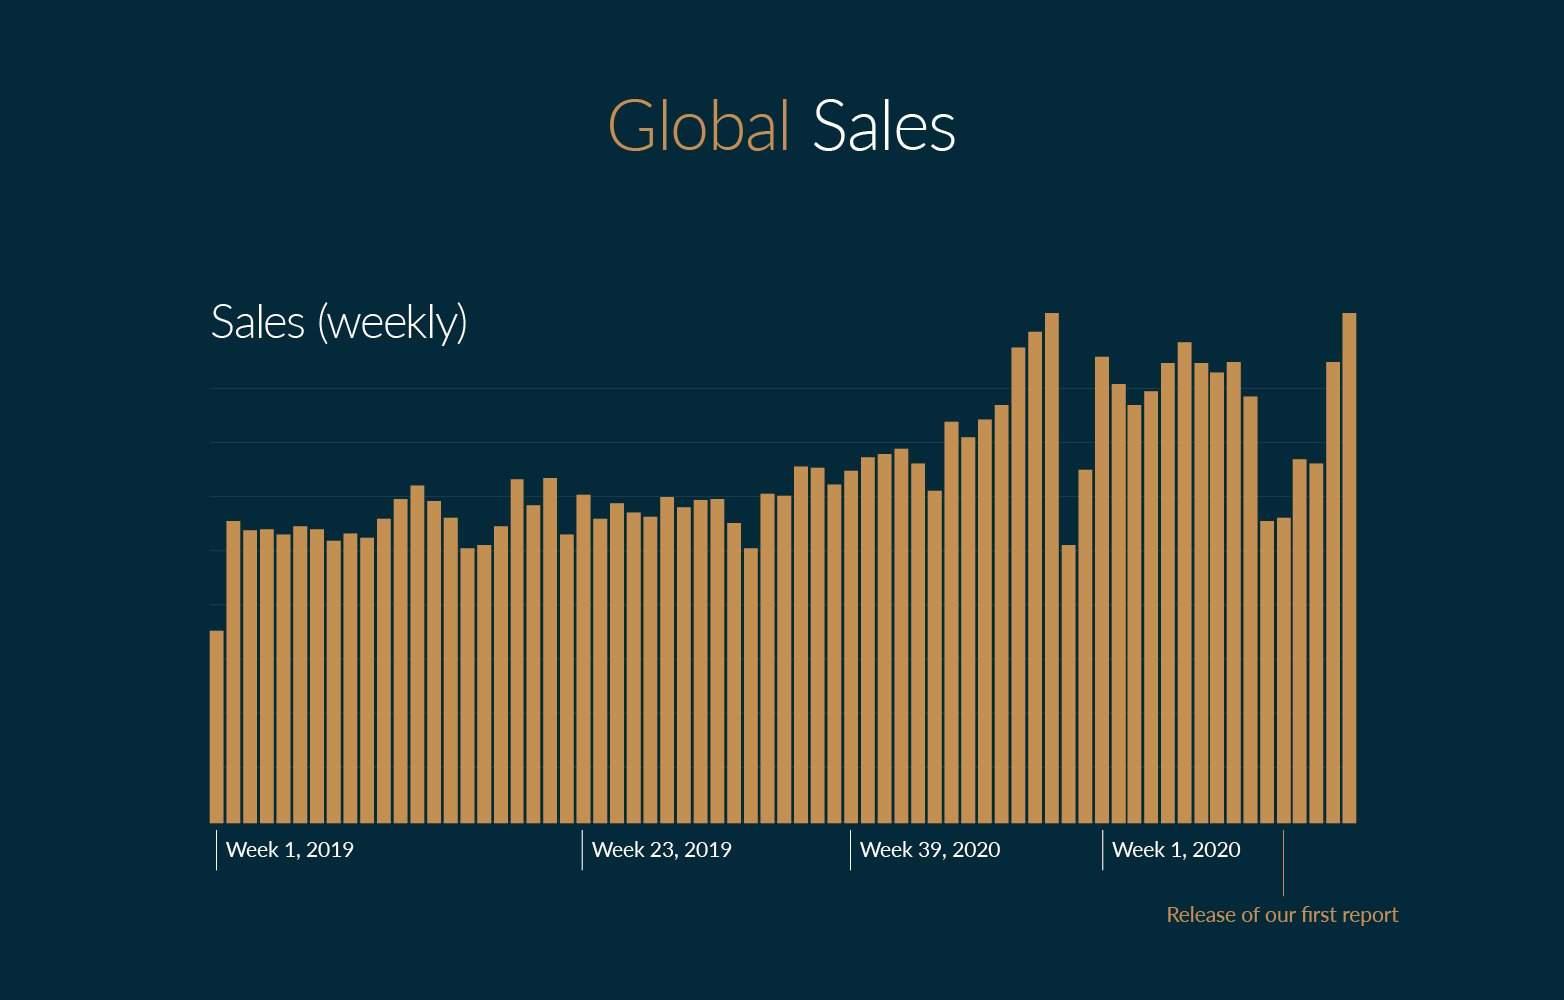 Global Sales on Chrono24 (weekly)